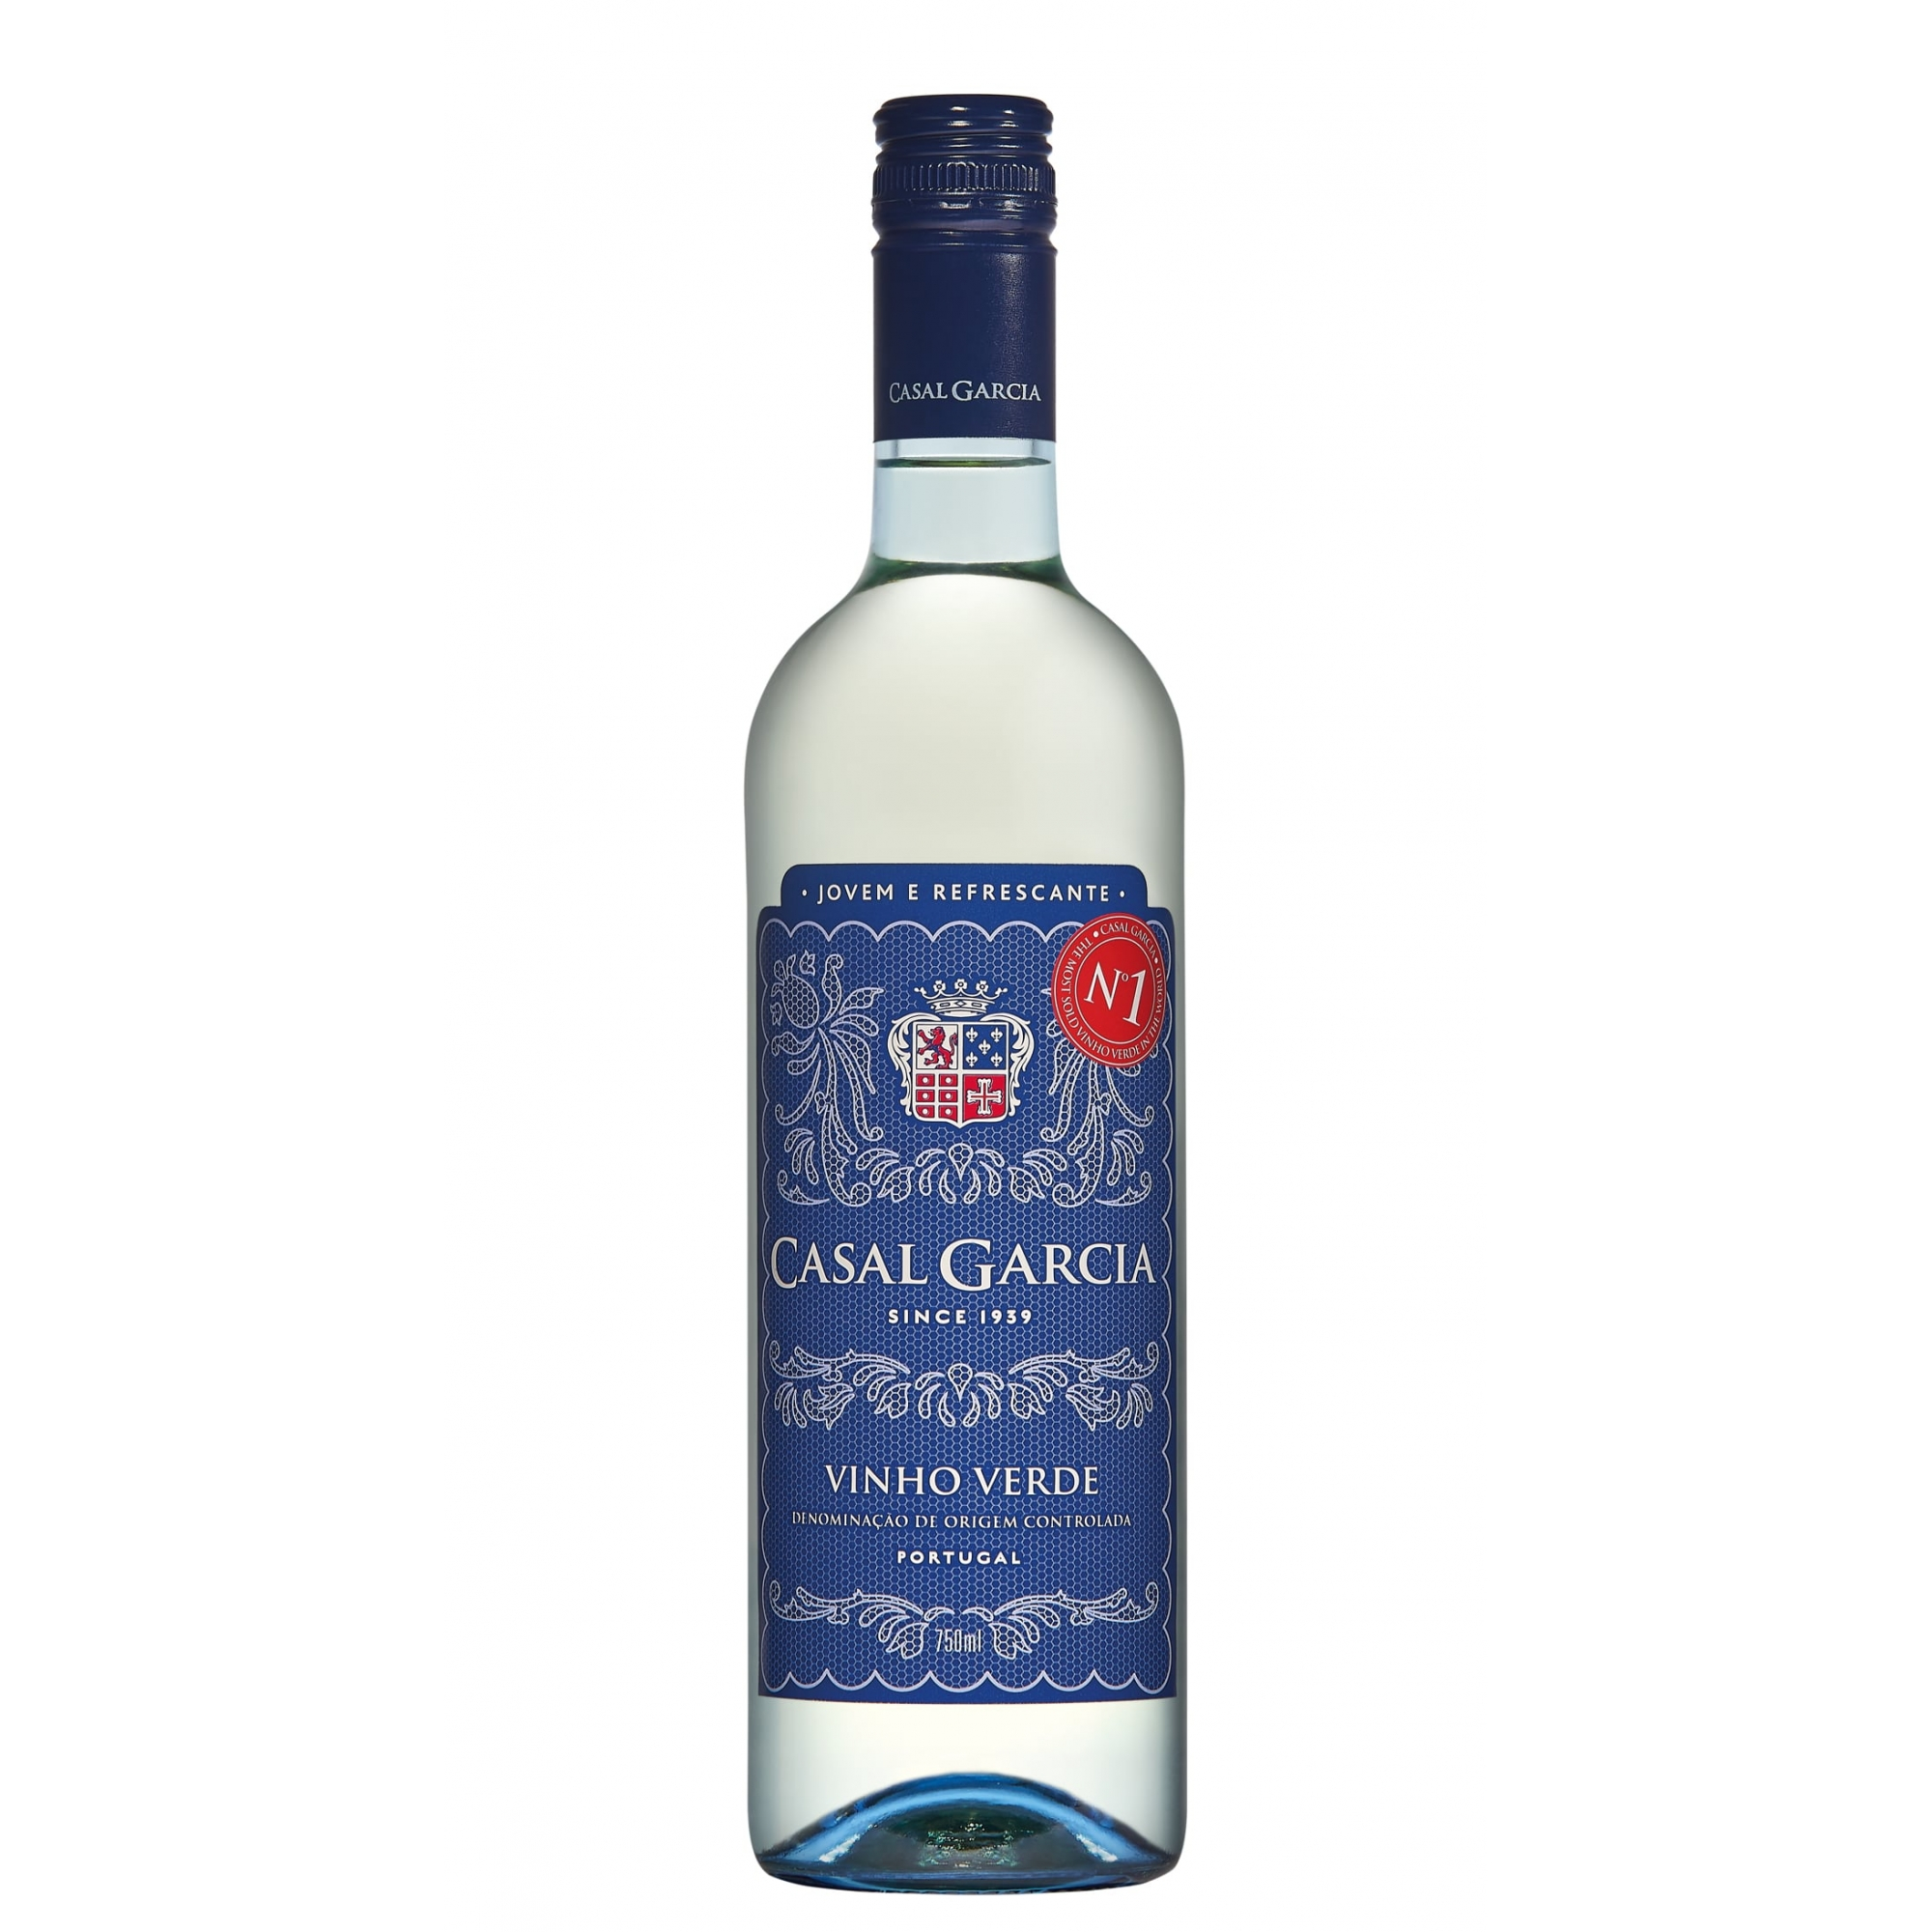 Vinho Verde Casal Garcia Branco 750ml